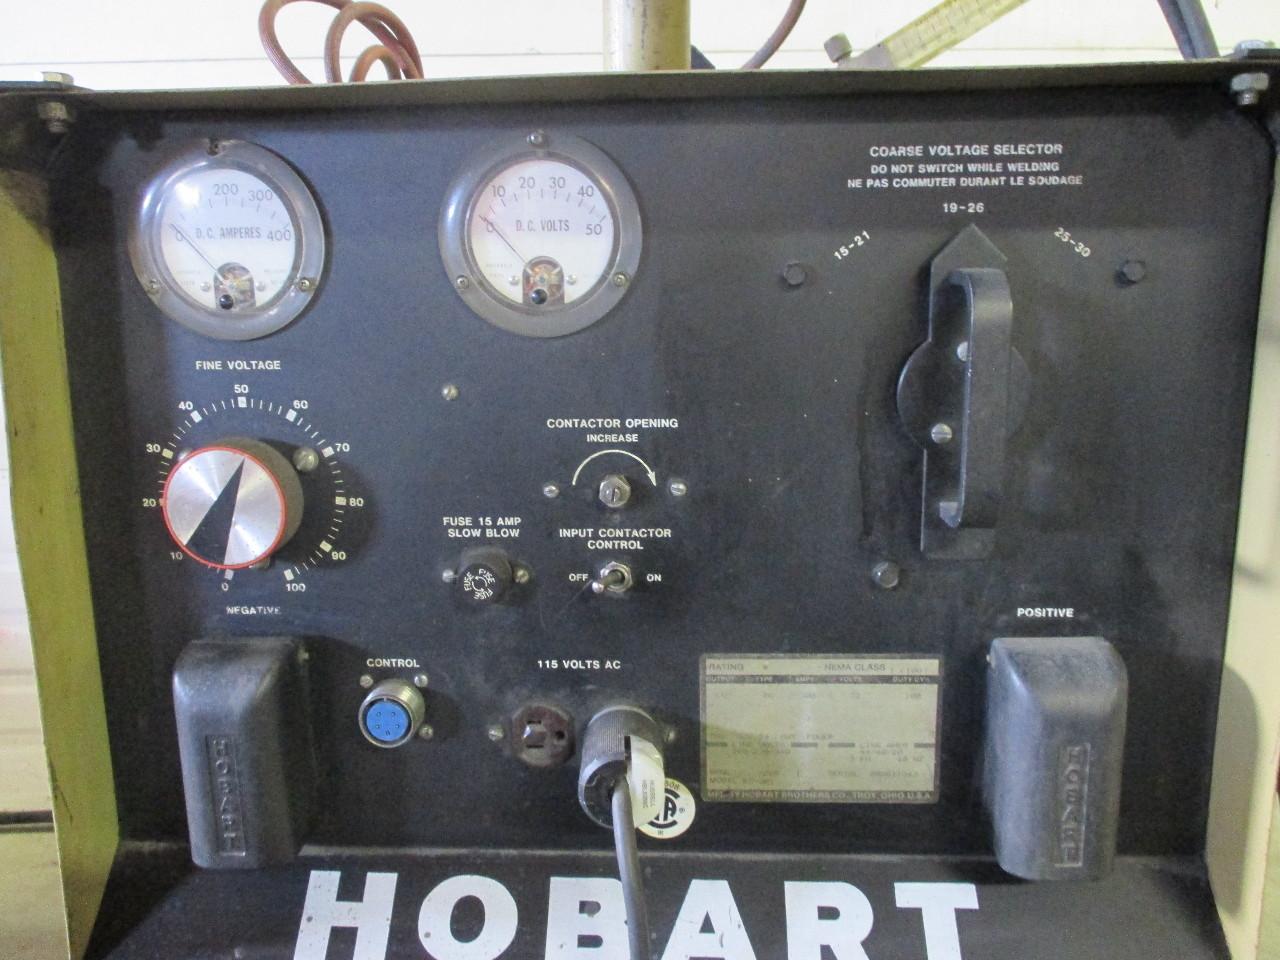 hight resolution of  hobart rc 301 welder 300 amp with hobart 2210 wire feeder